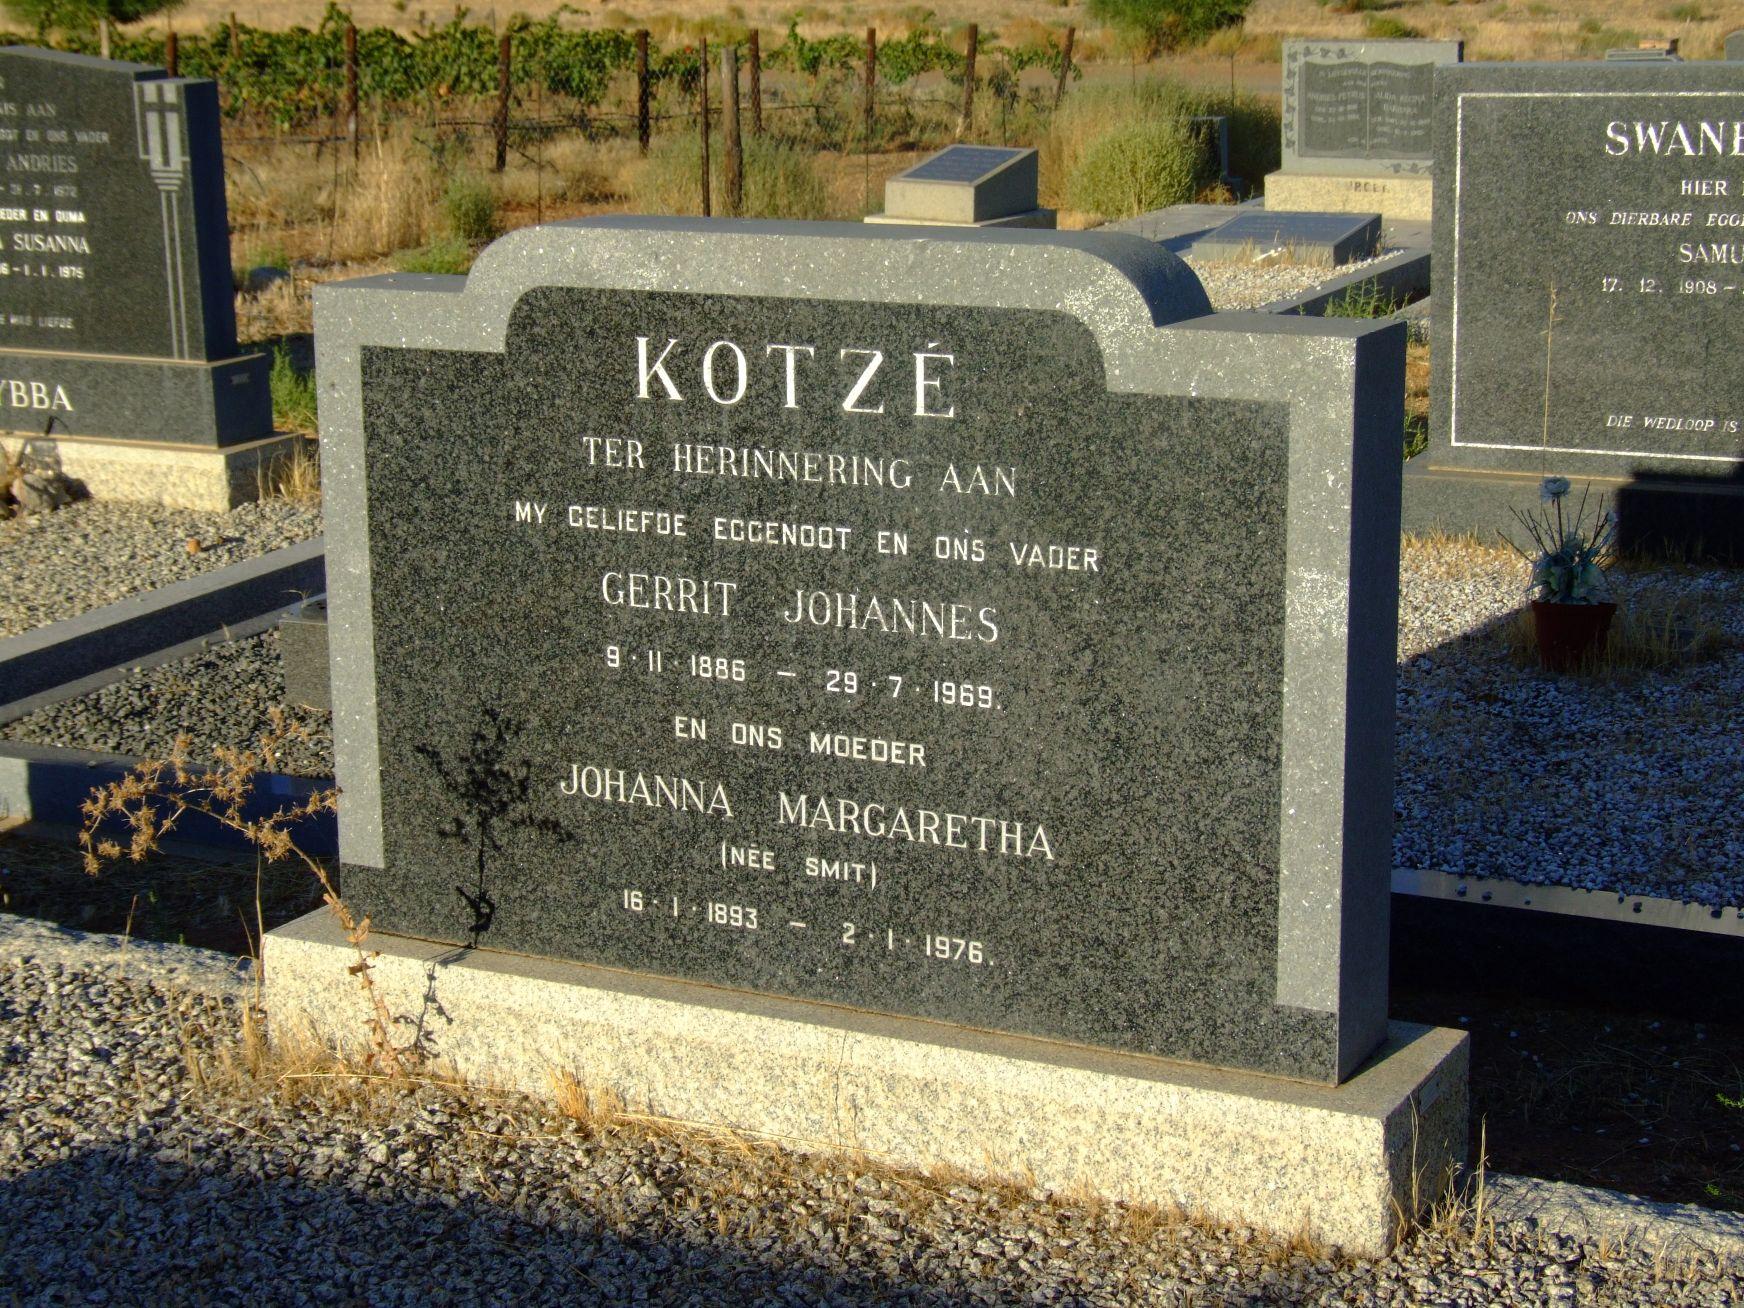 Kotze, Gerrit Johannes + Kotze, Johanna Margaretha